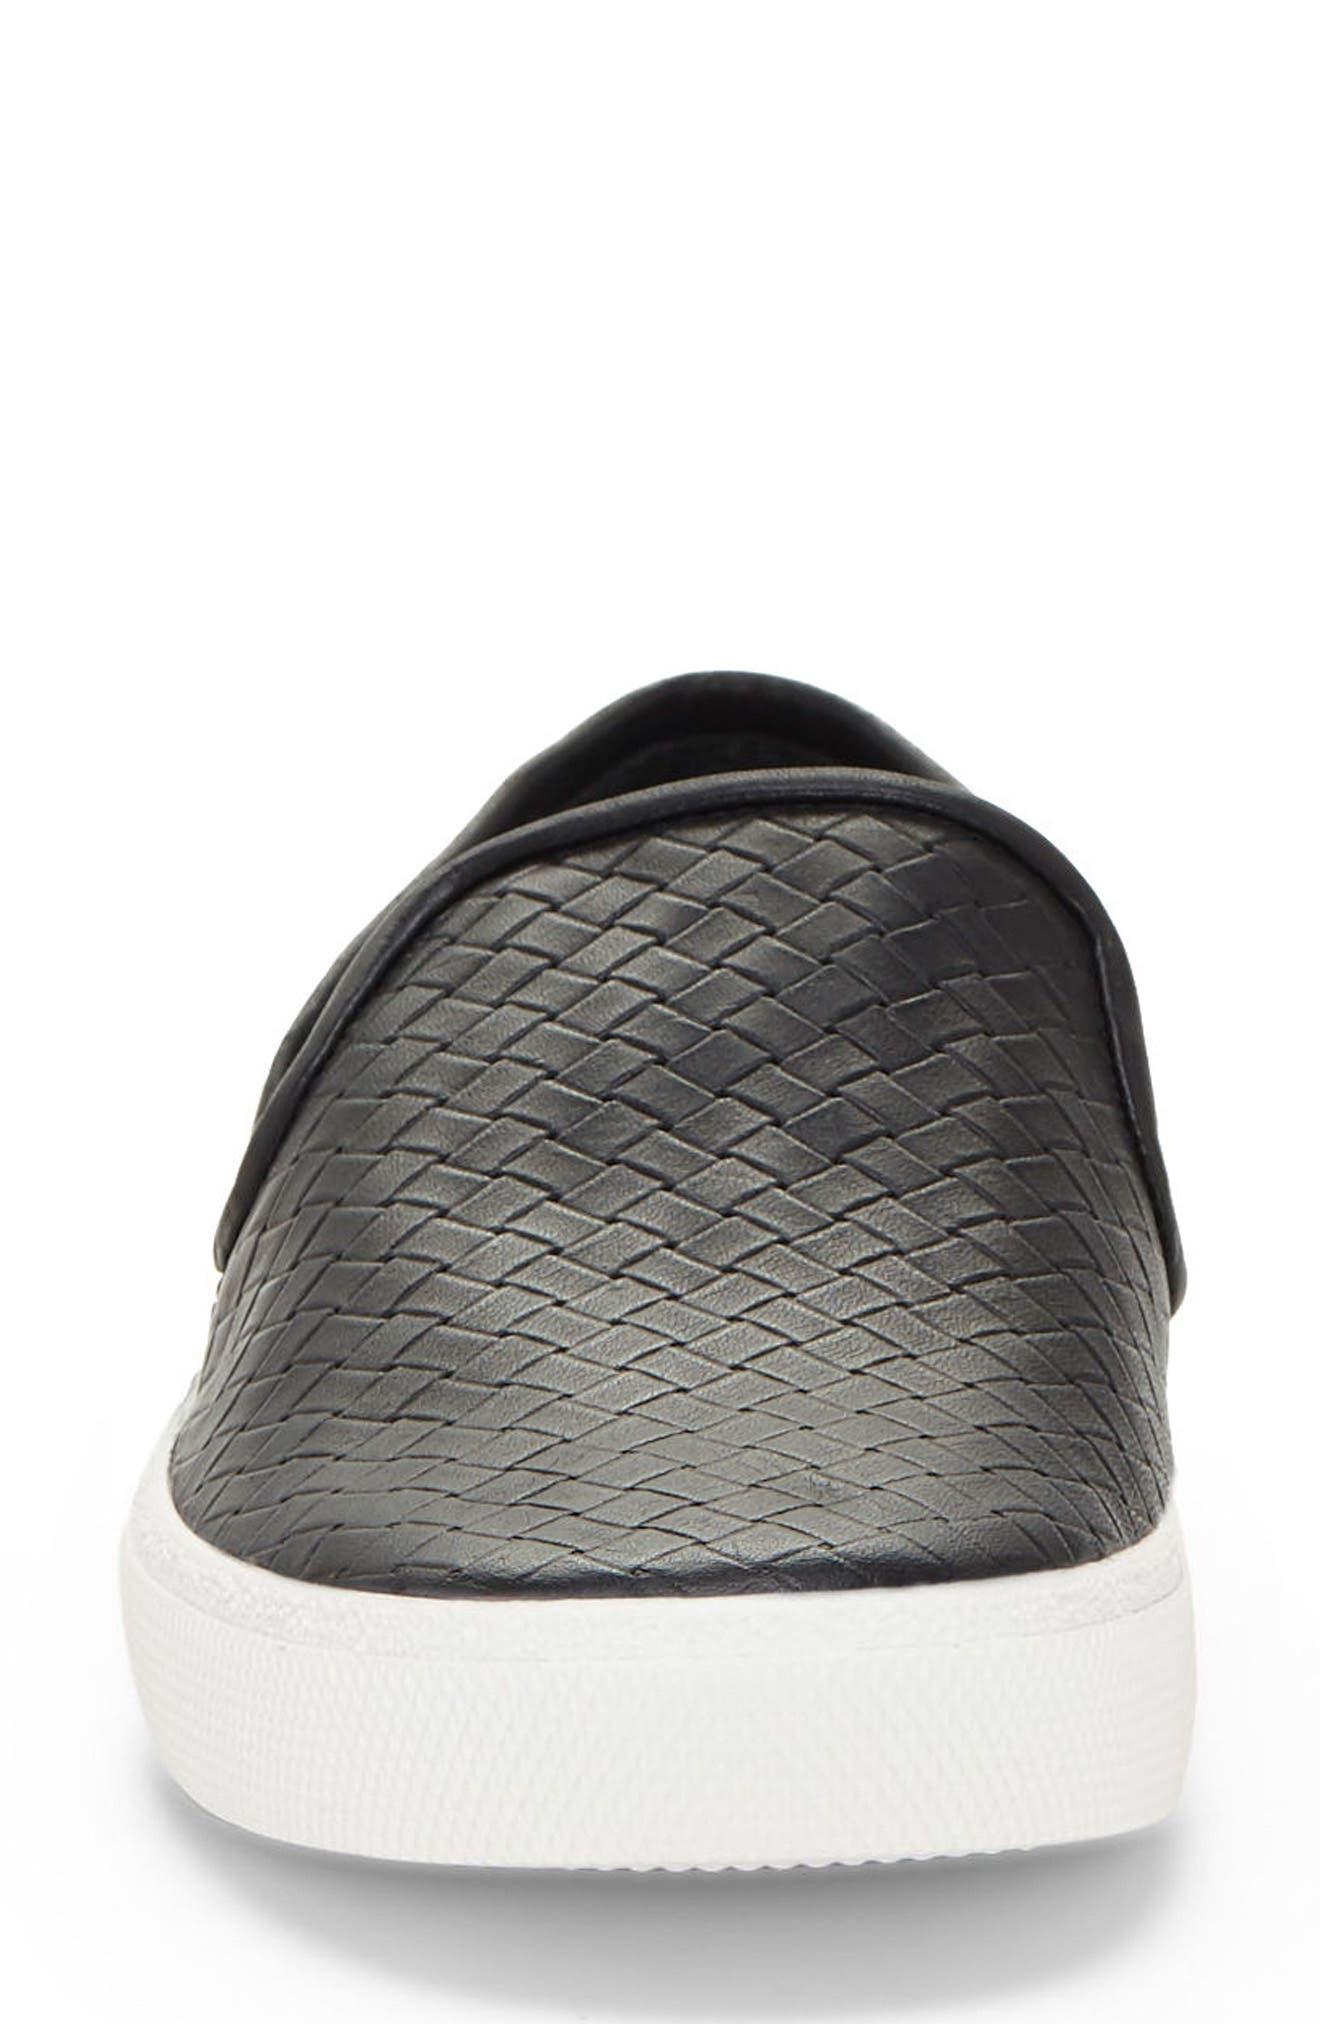 Cariana Slip-On Sneaker,                             Alternate thumbnail 4, color,                             001